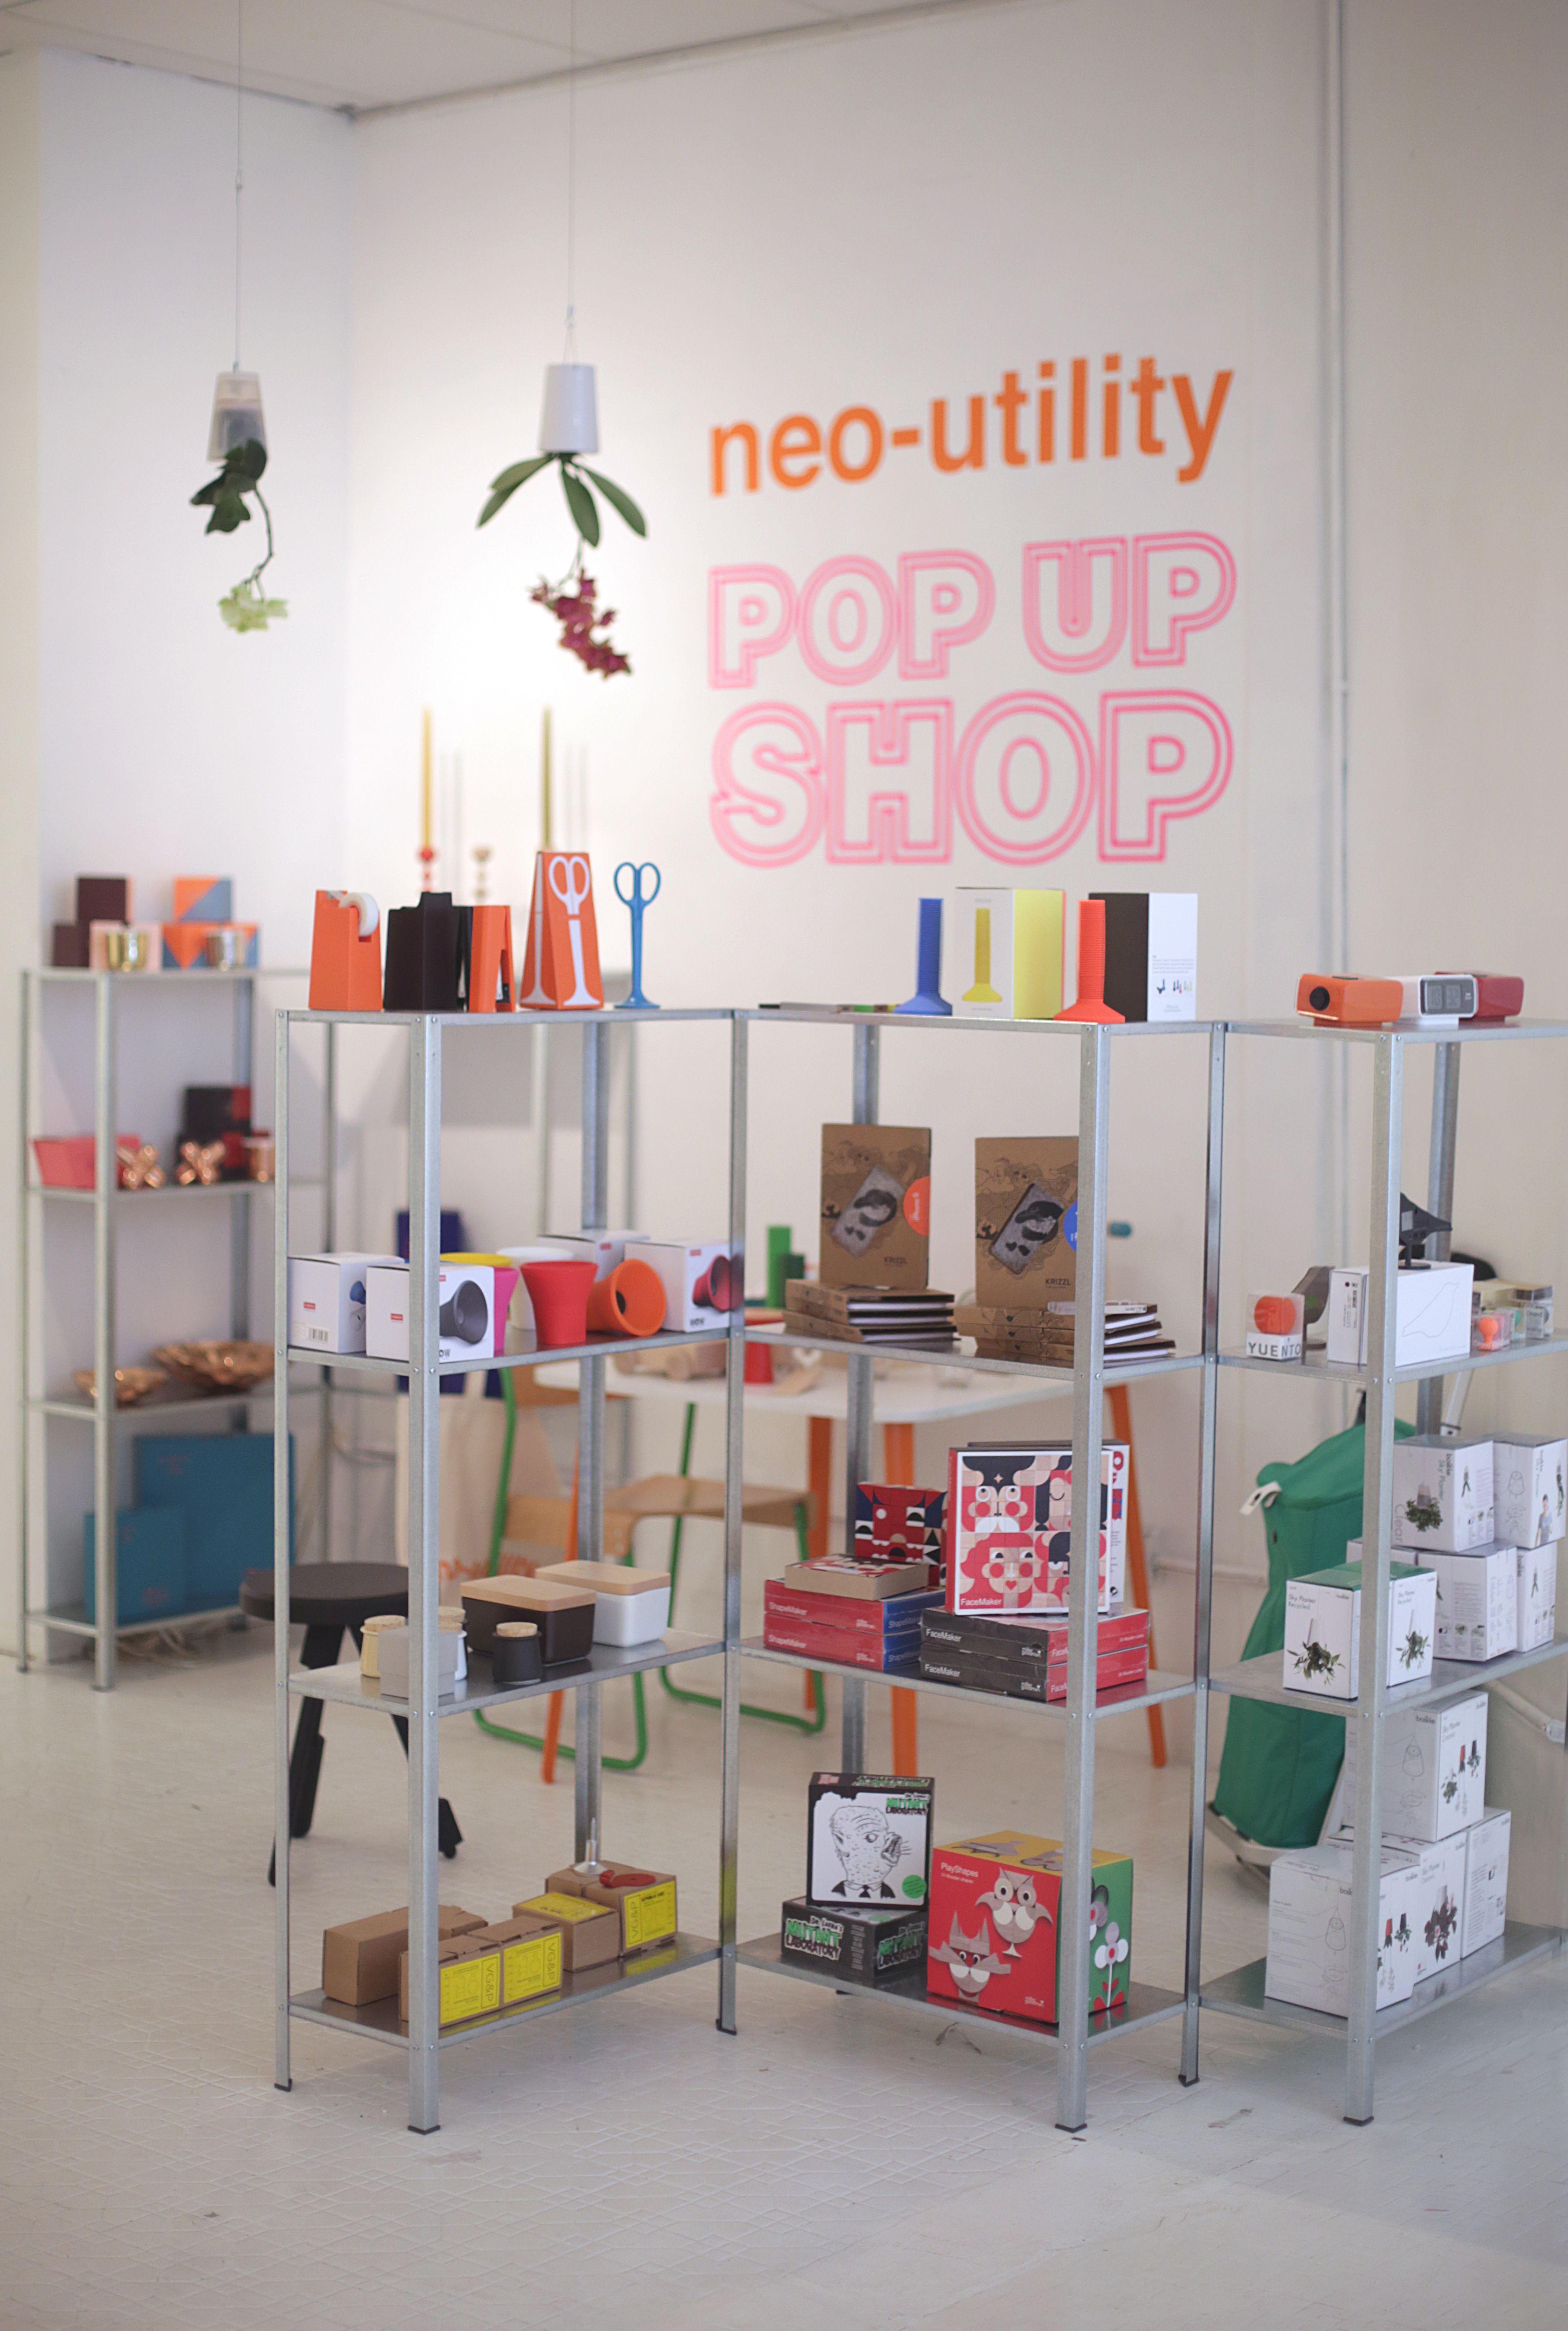 neo utility pop up shop intro ny paper pop up shops pop up stores und pop up. Black Bedroom Furniture Sets. Home Design Ideas